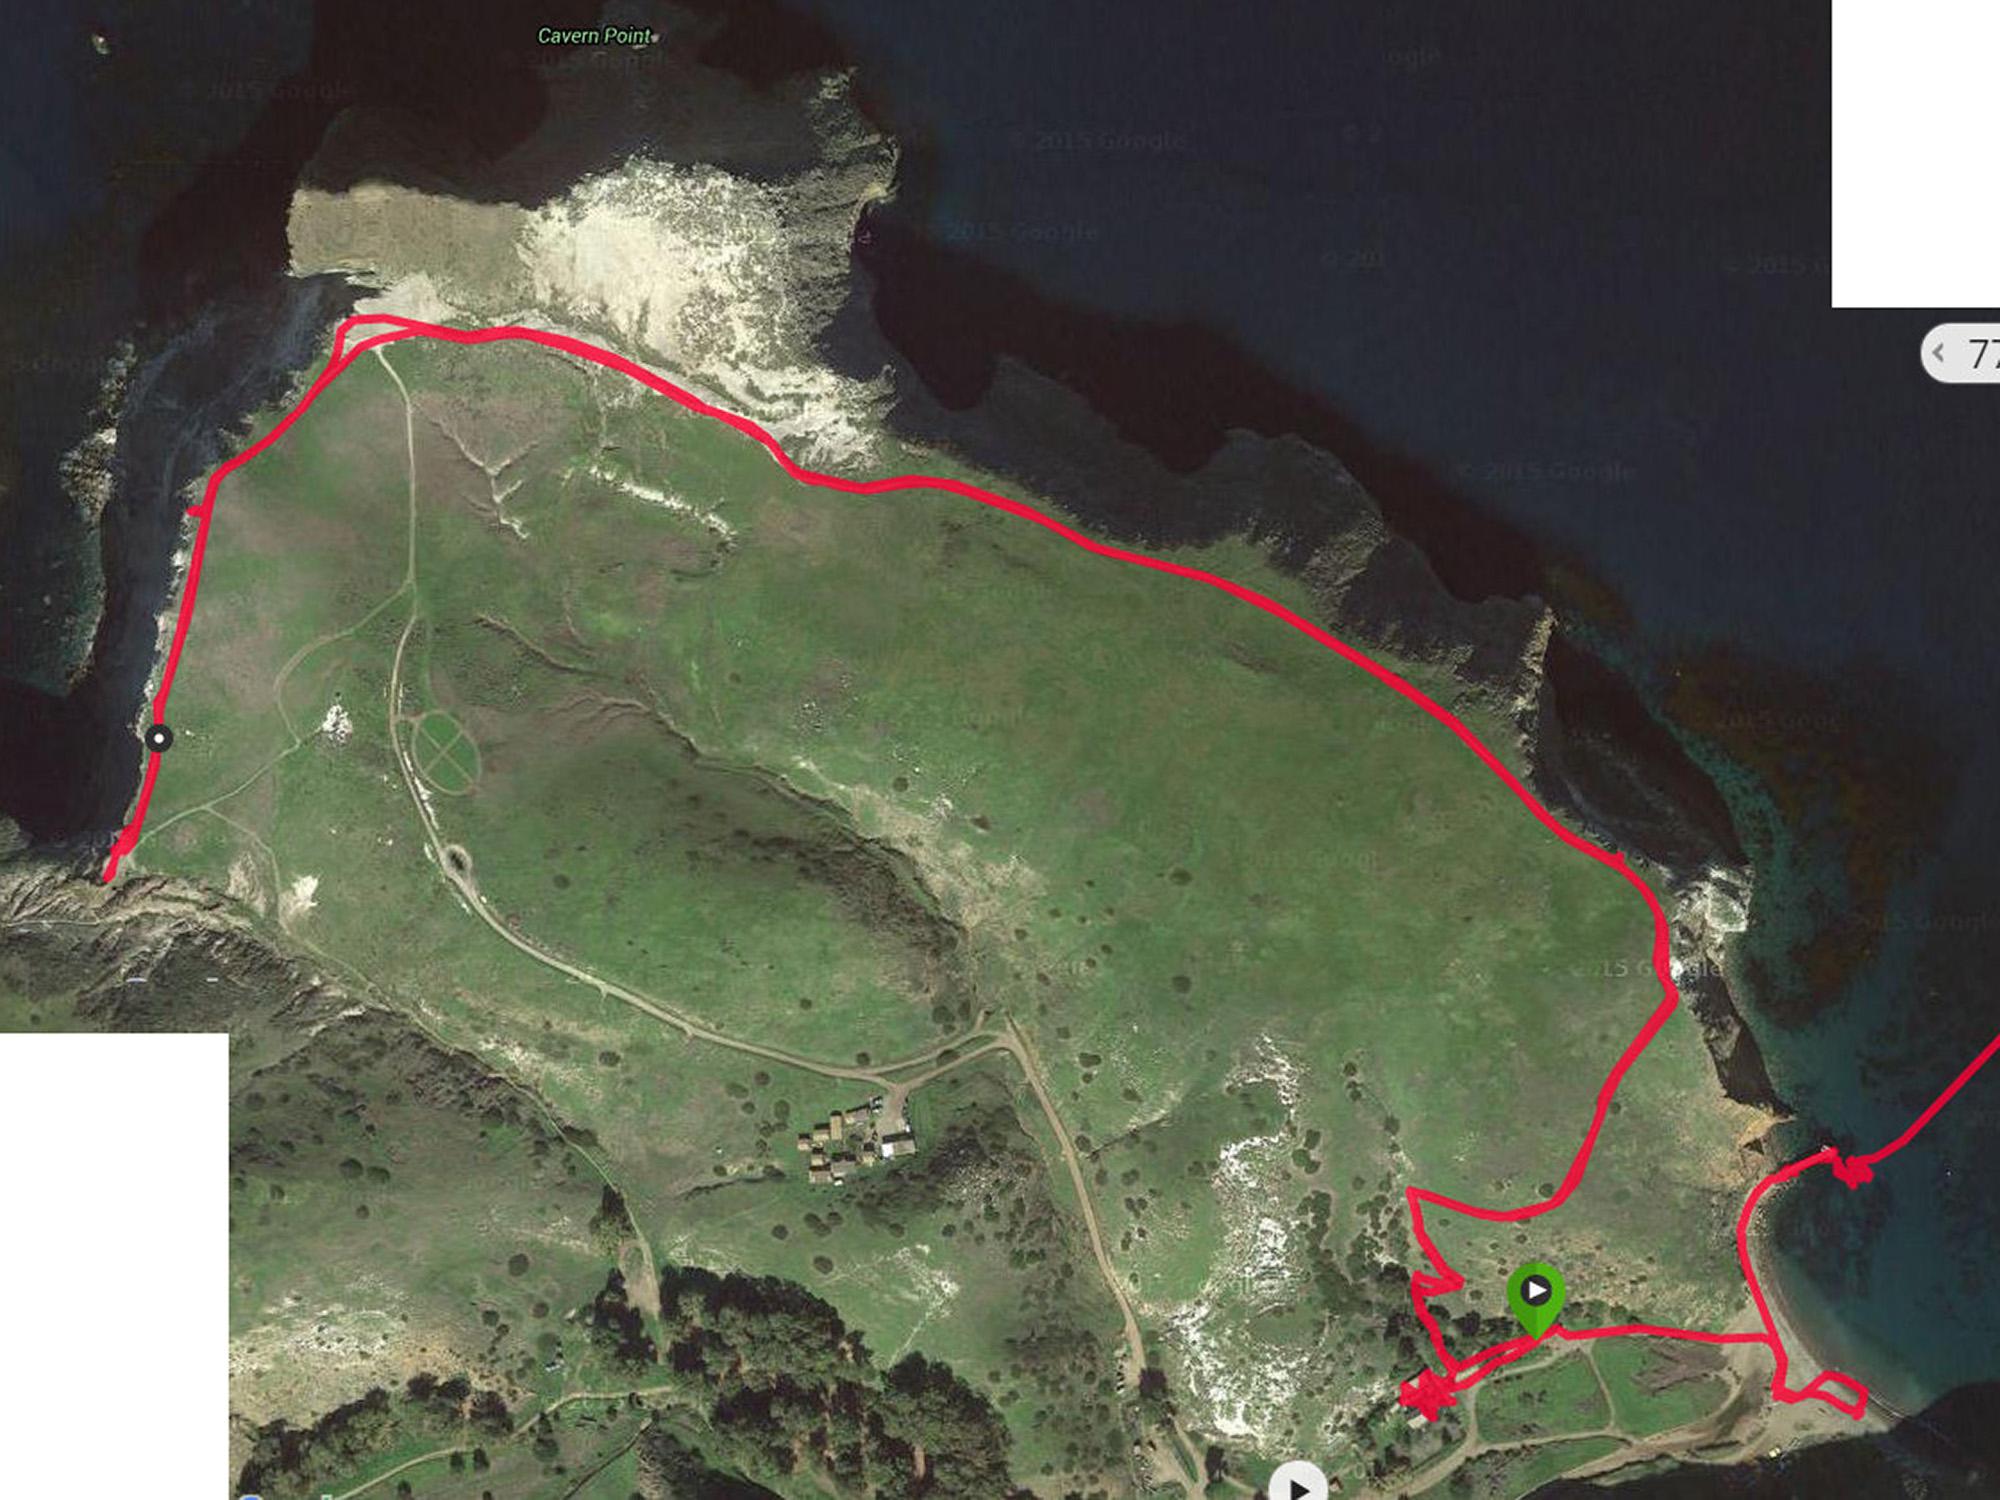 detail view of GPS track of 3 mile hike on Santa Cruz Island